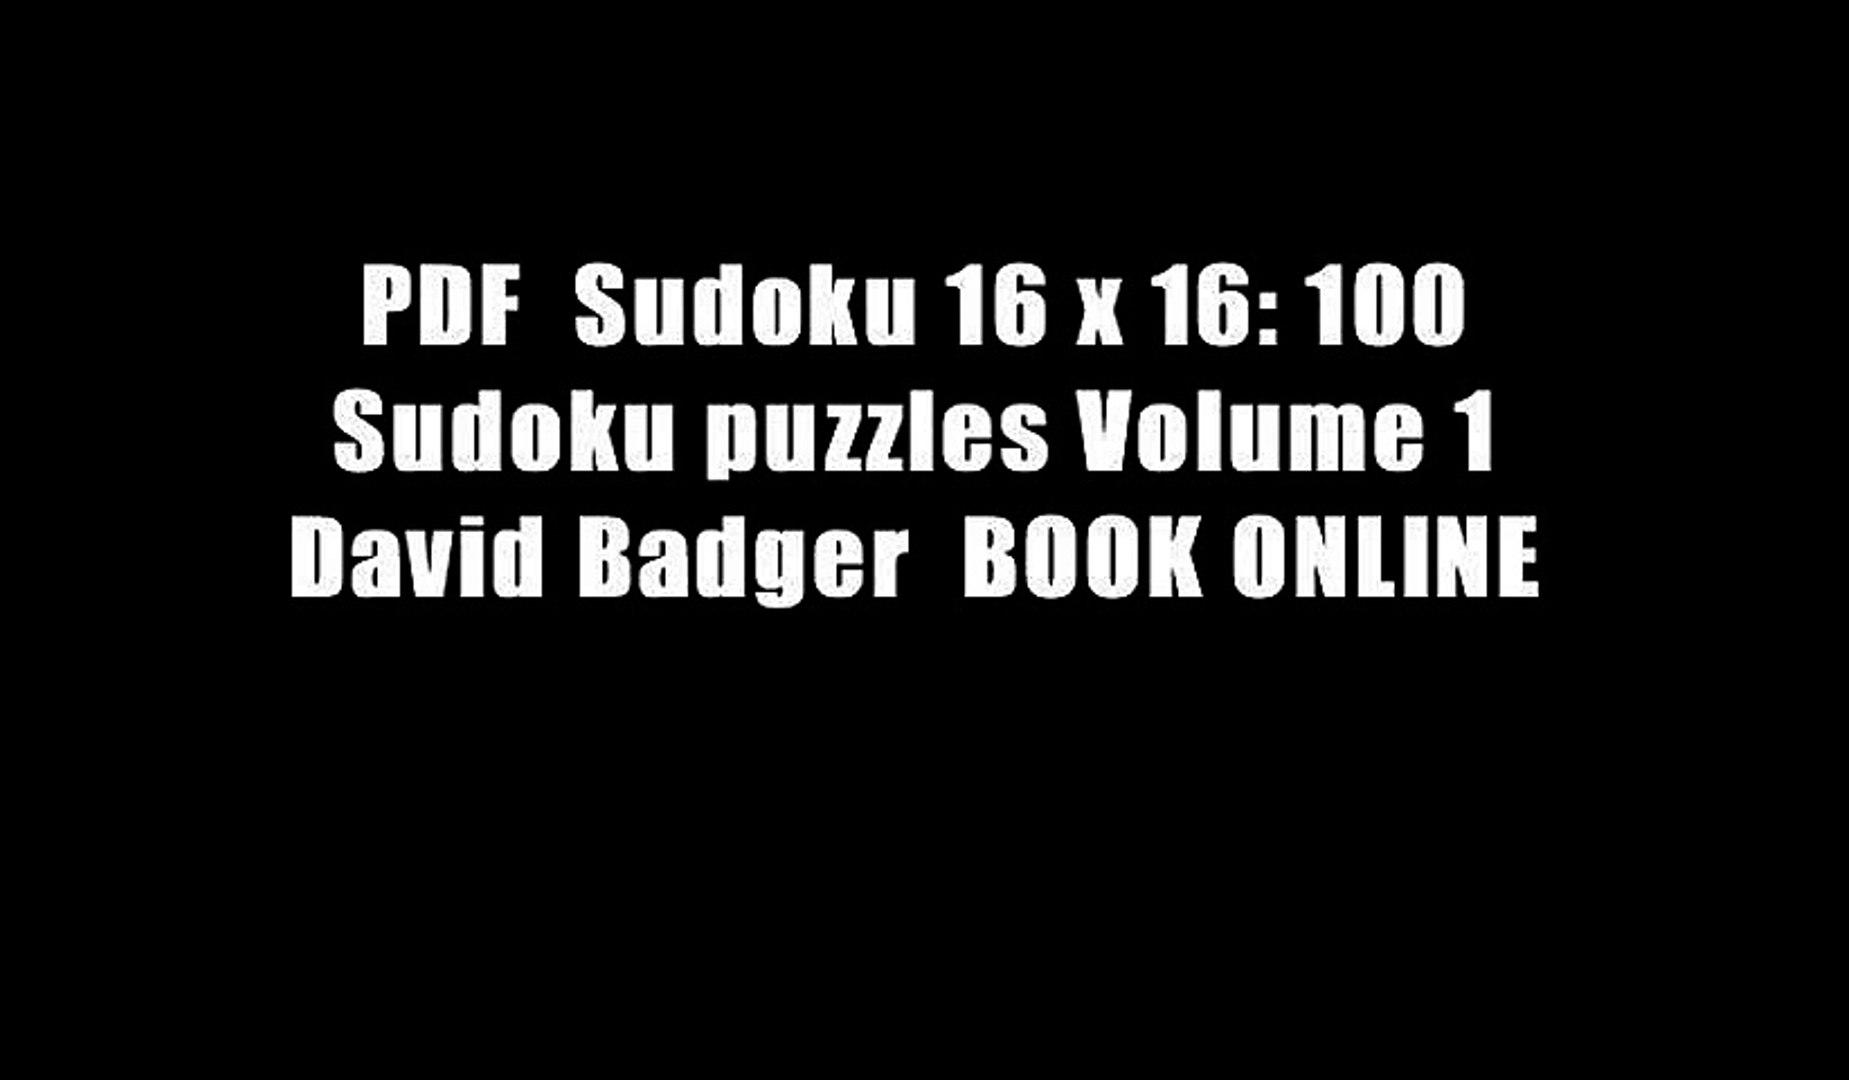 PDF Sudoku 16 x 16: 100 Sudoku puzzles Volume 1 David Badger BOOK ONLINE